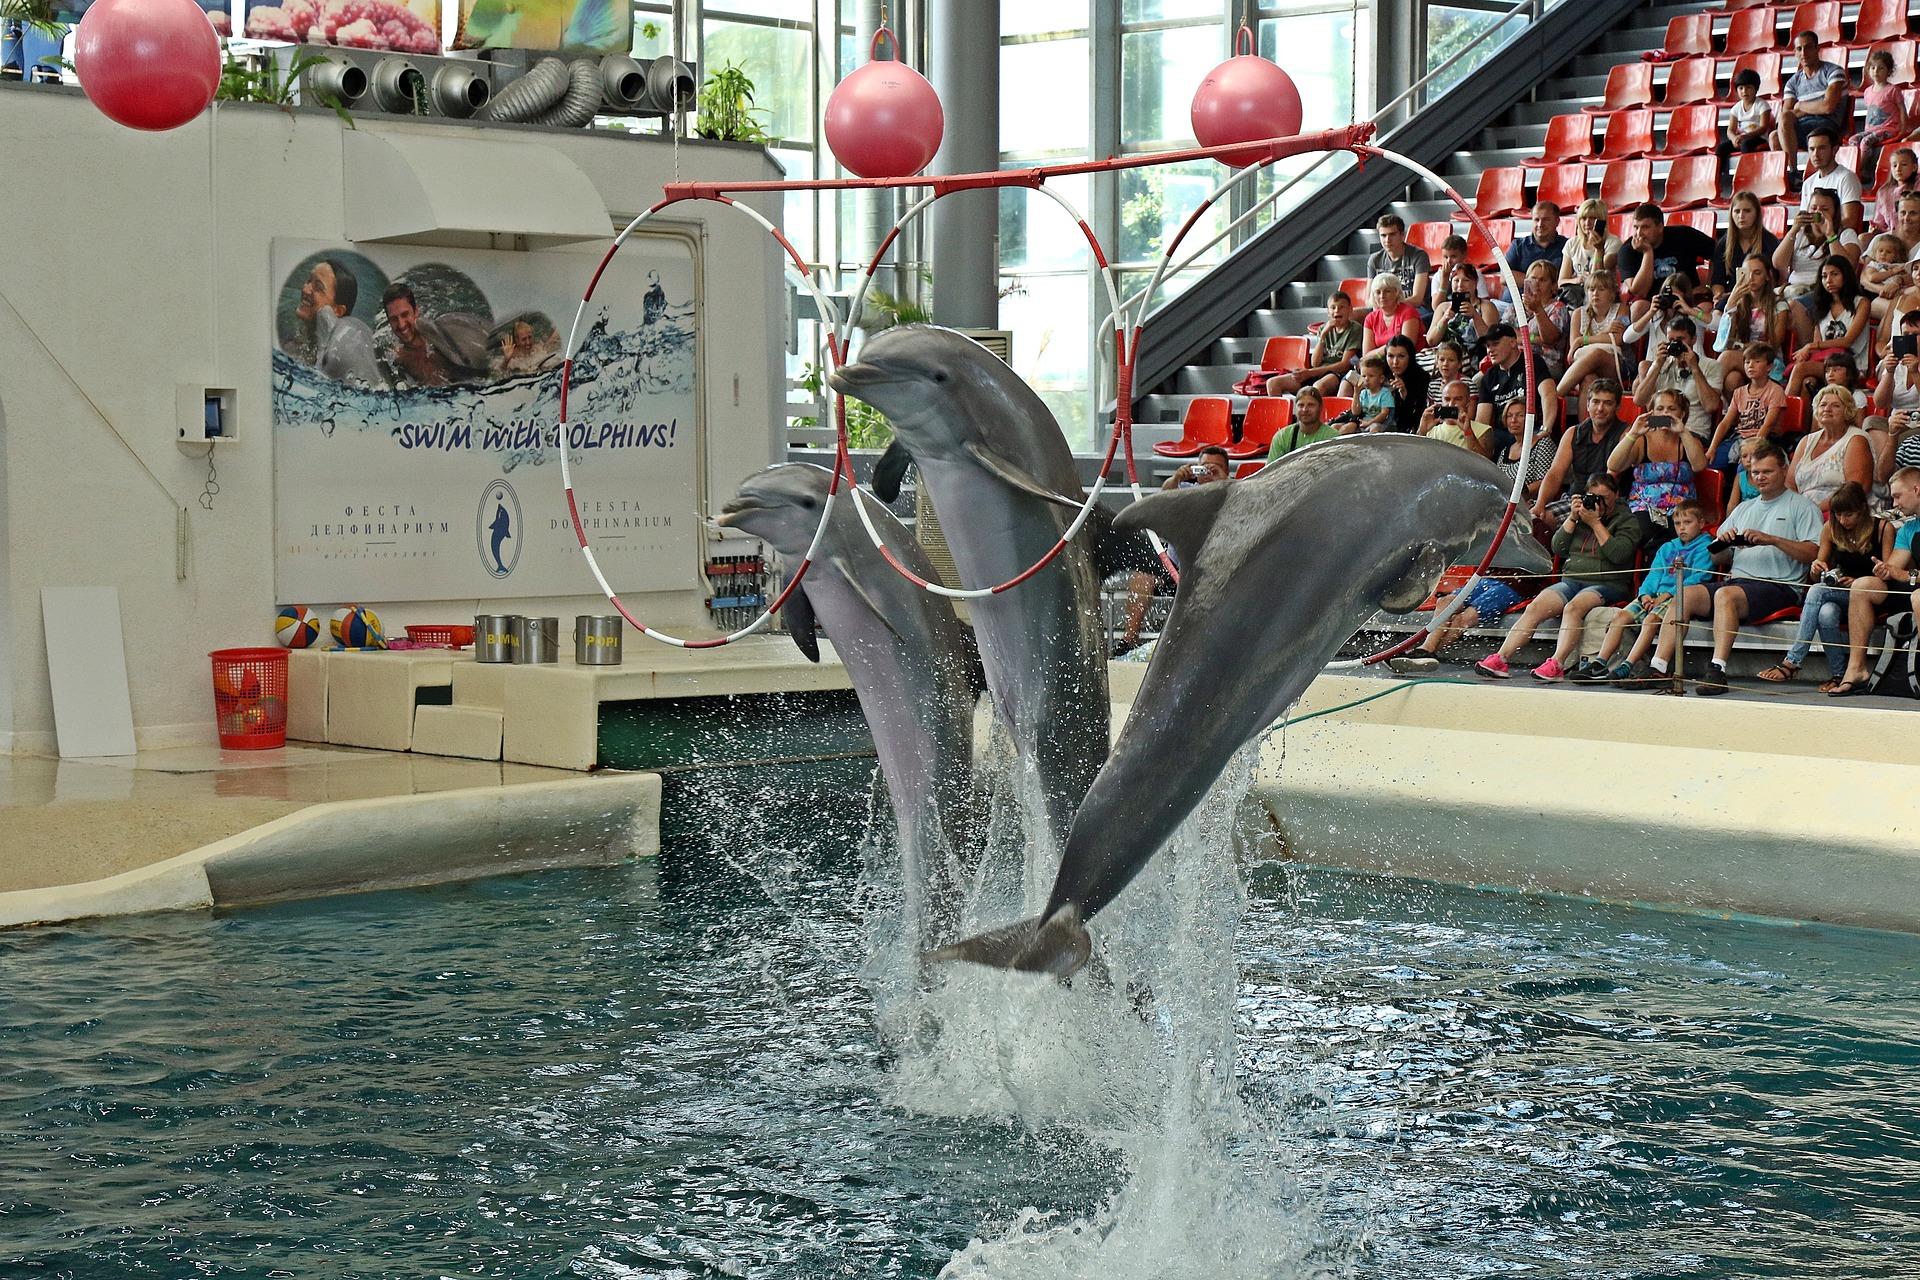 dolphins_1651975_1920.jpg